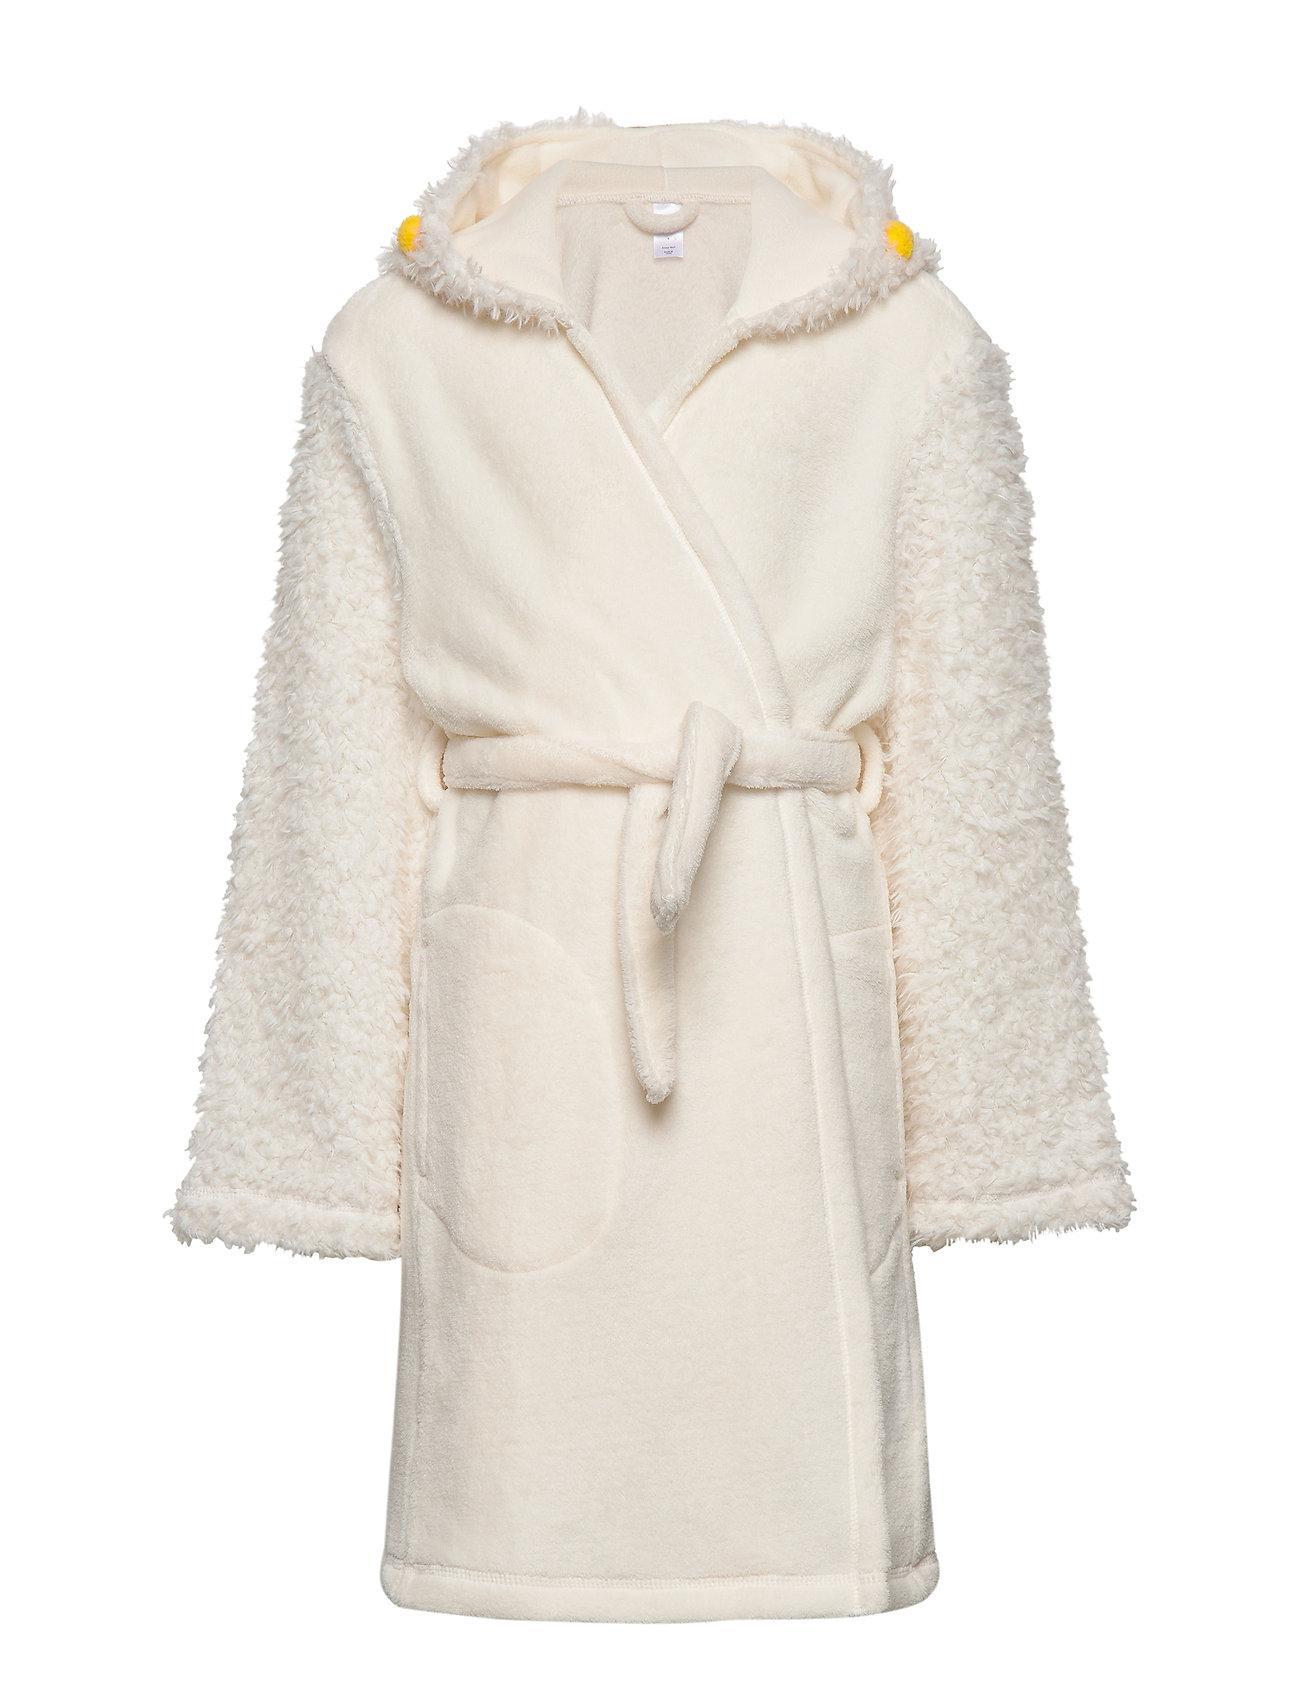 GAP Kids Llama Robe - IVORY FROST